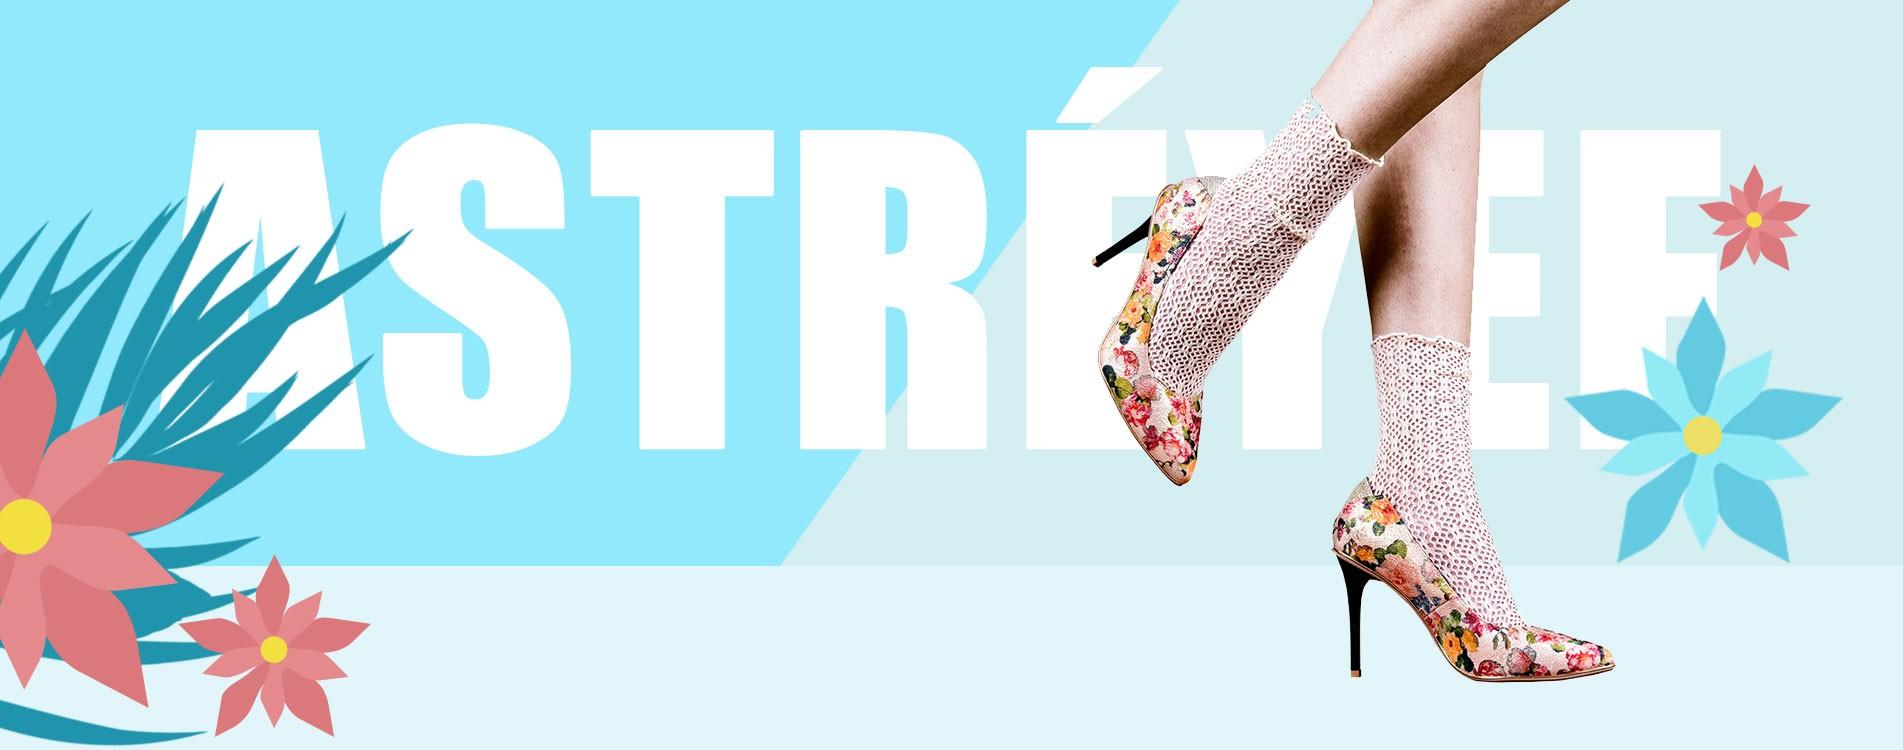 Grossiste chaussures en ligne hommes femmes enfants - ASTRÉYEE